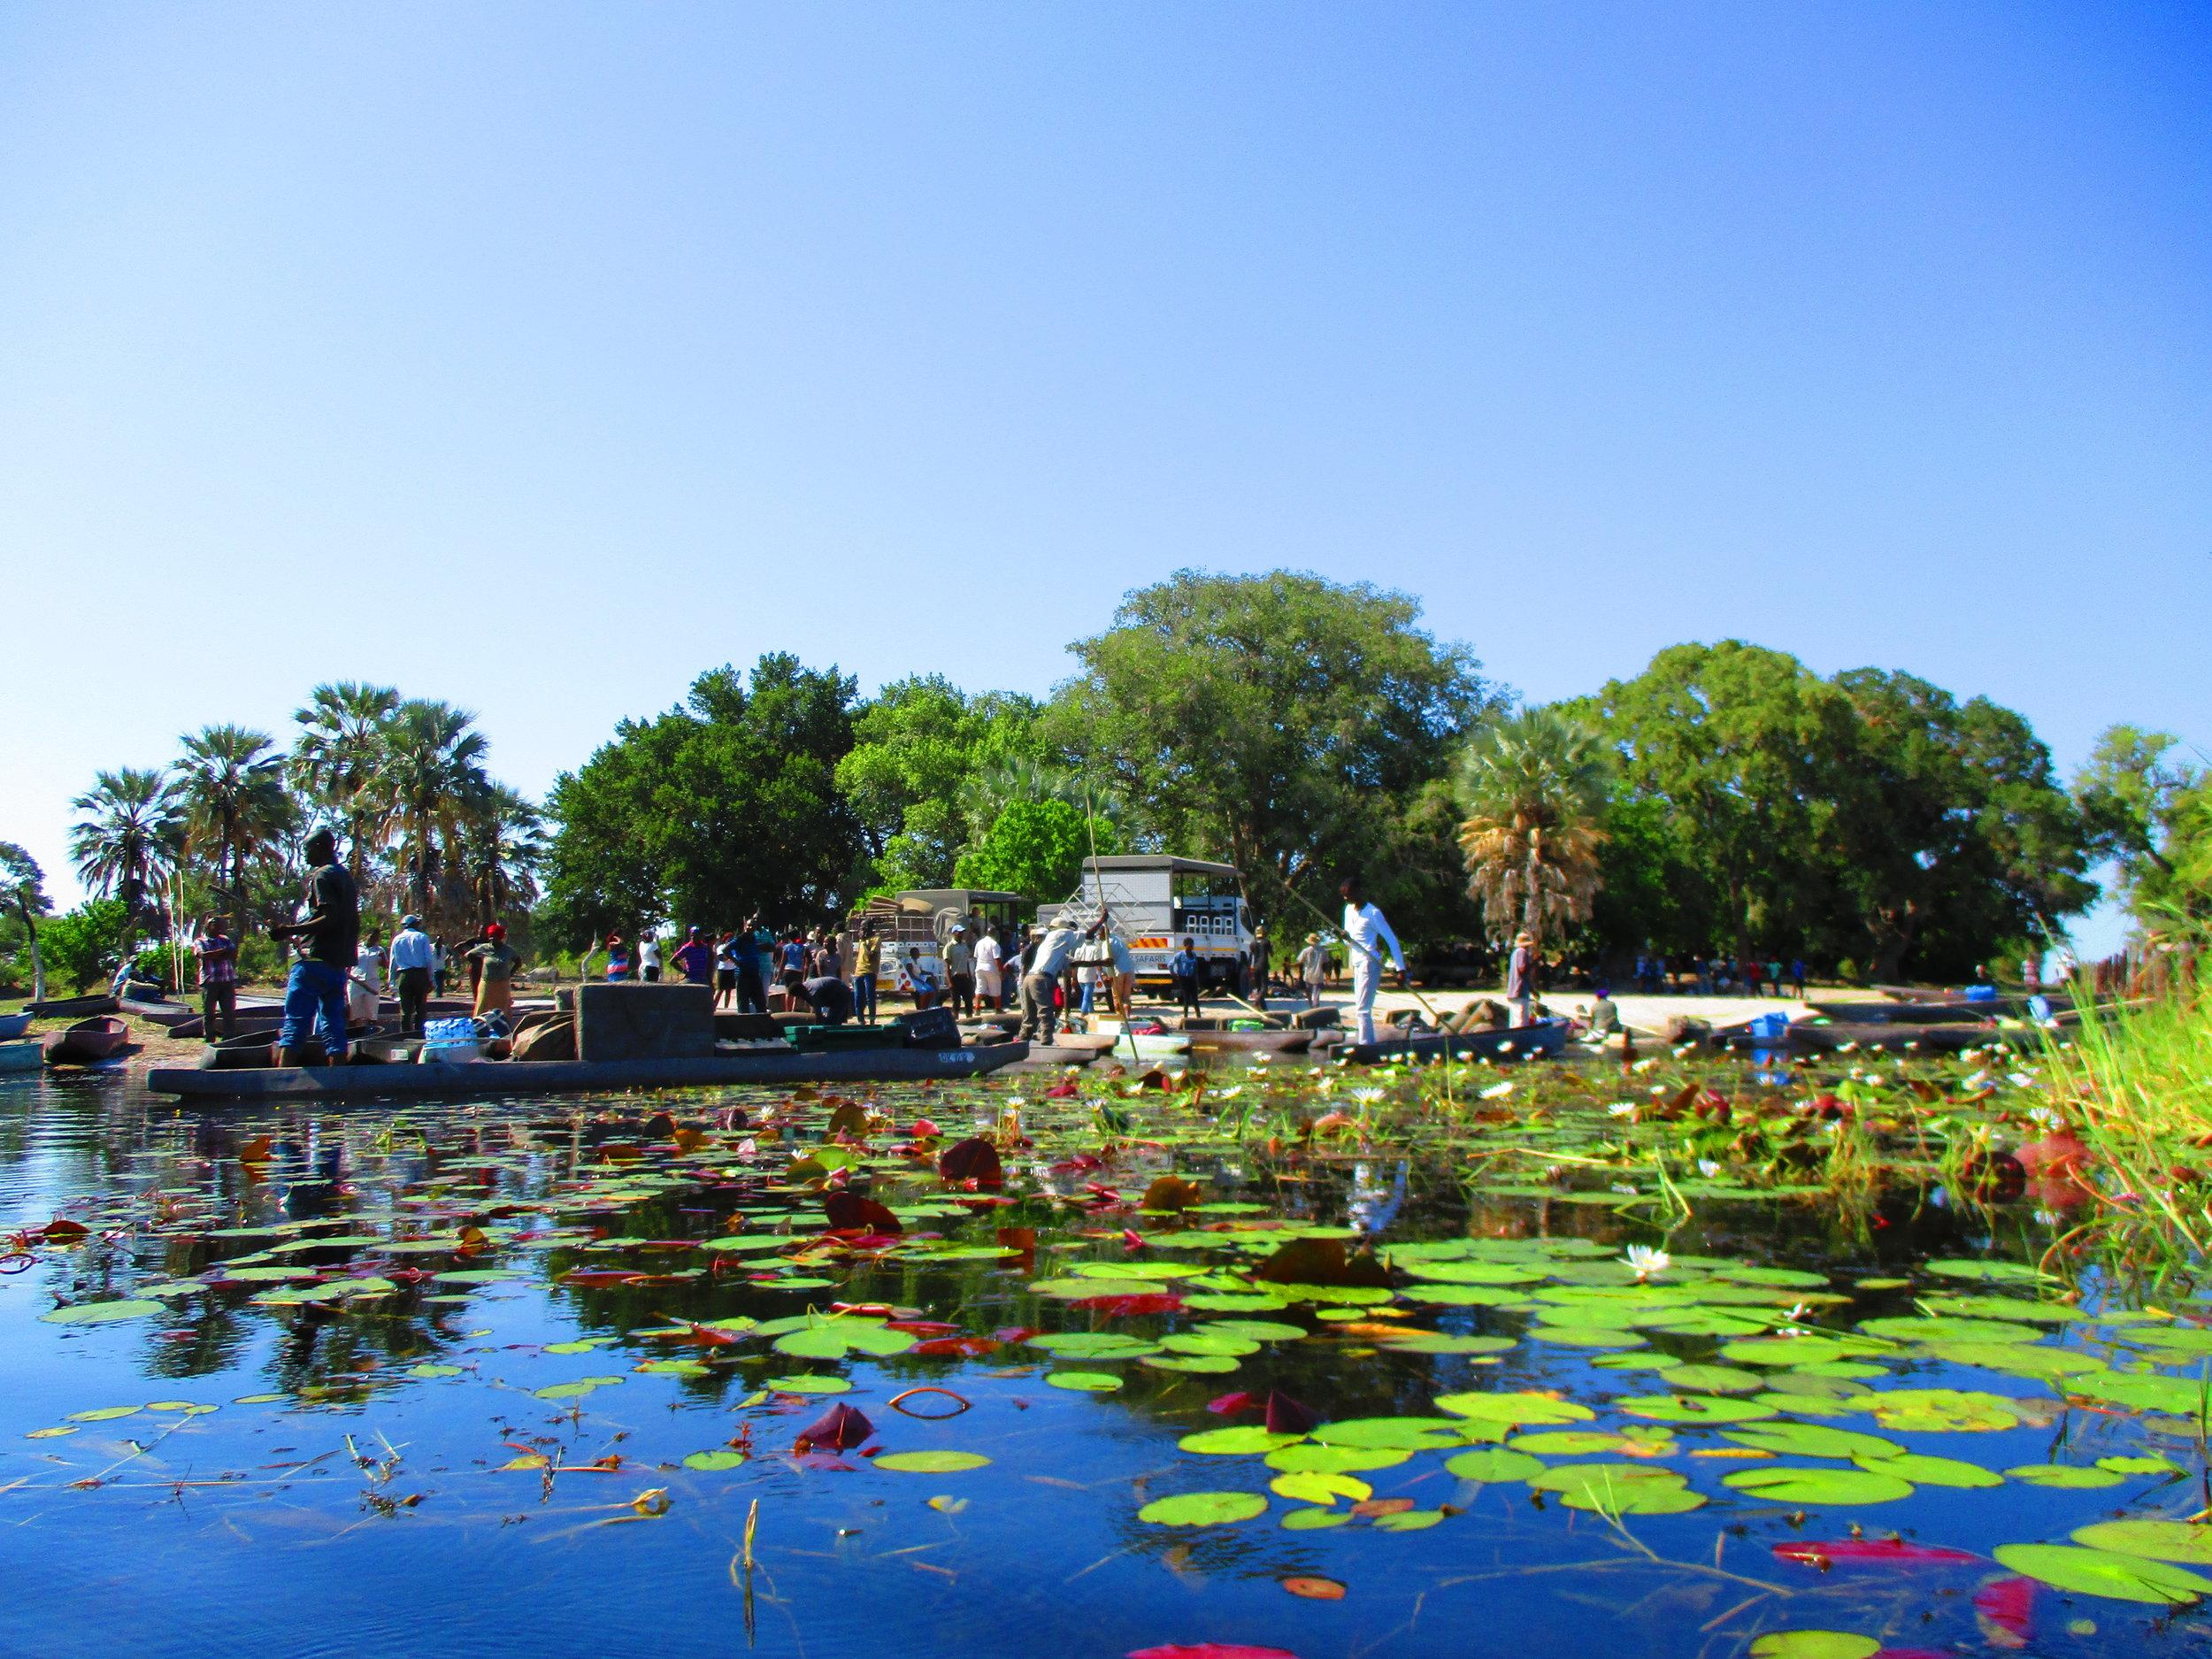 The start of our Mokoro trip on the Okavango Delta